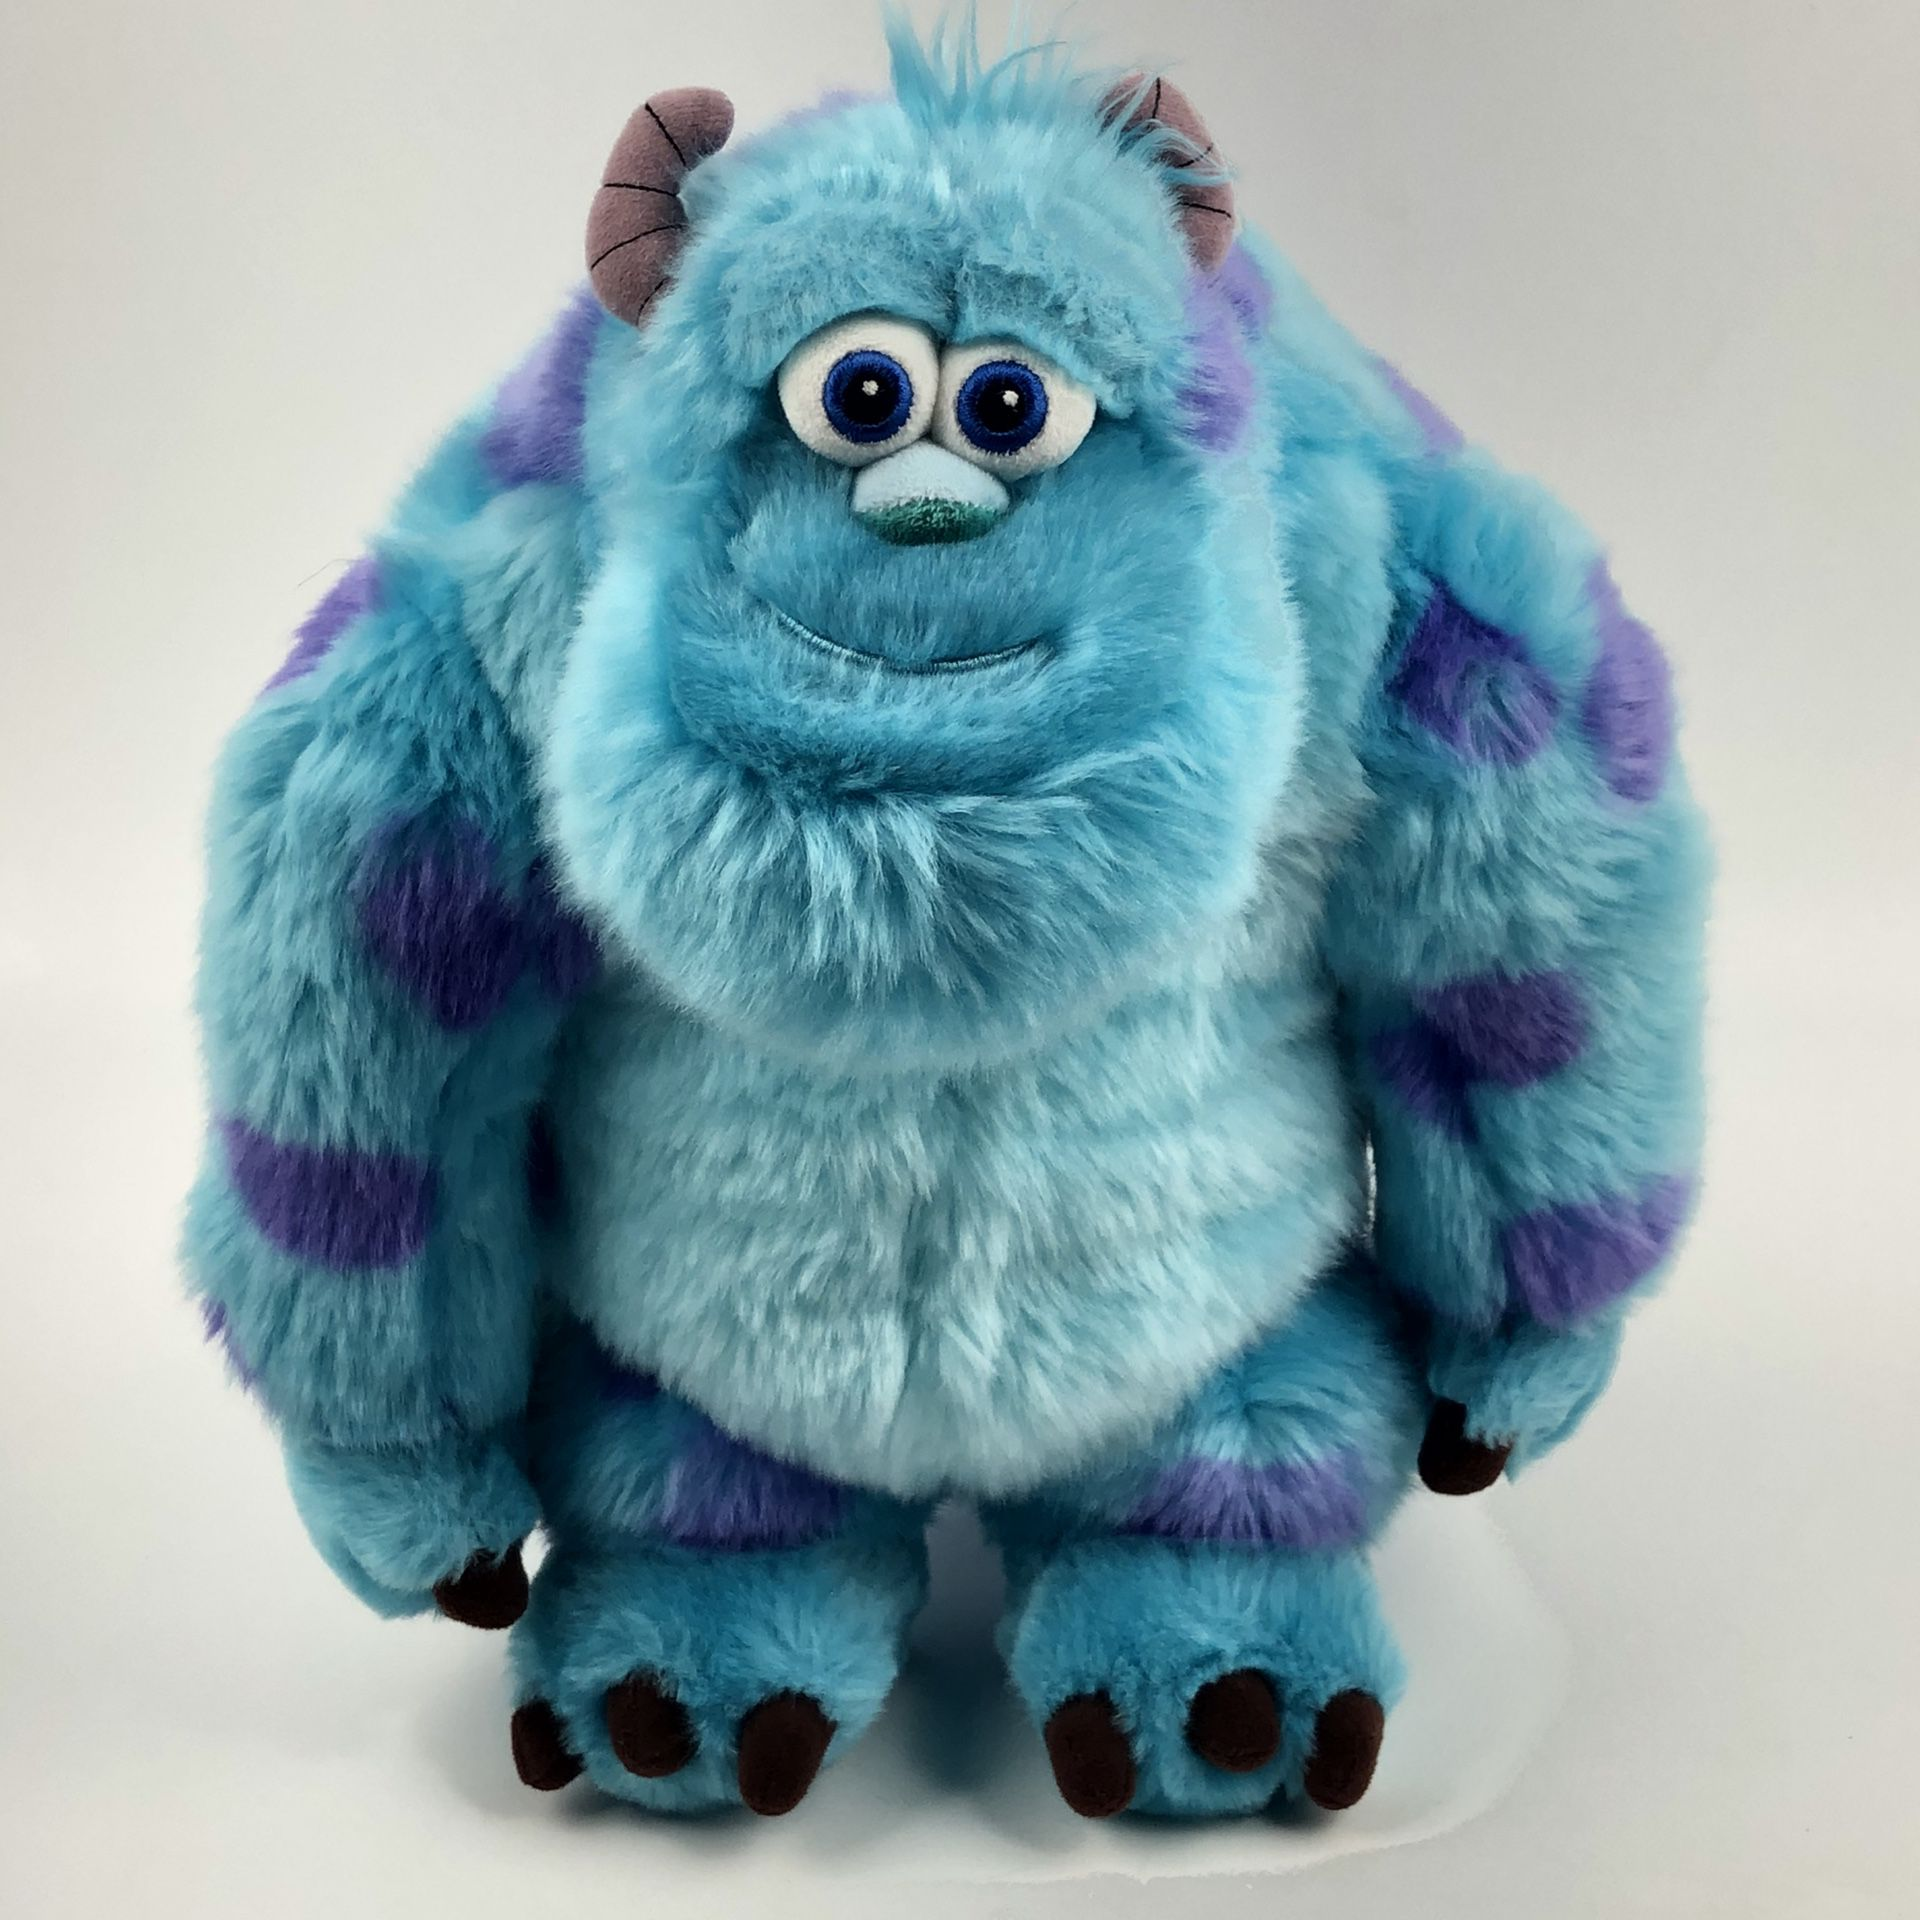 Sulley Disney Pixar Monsters Inc.